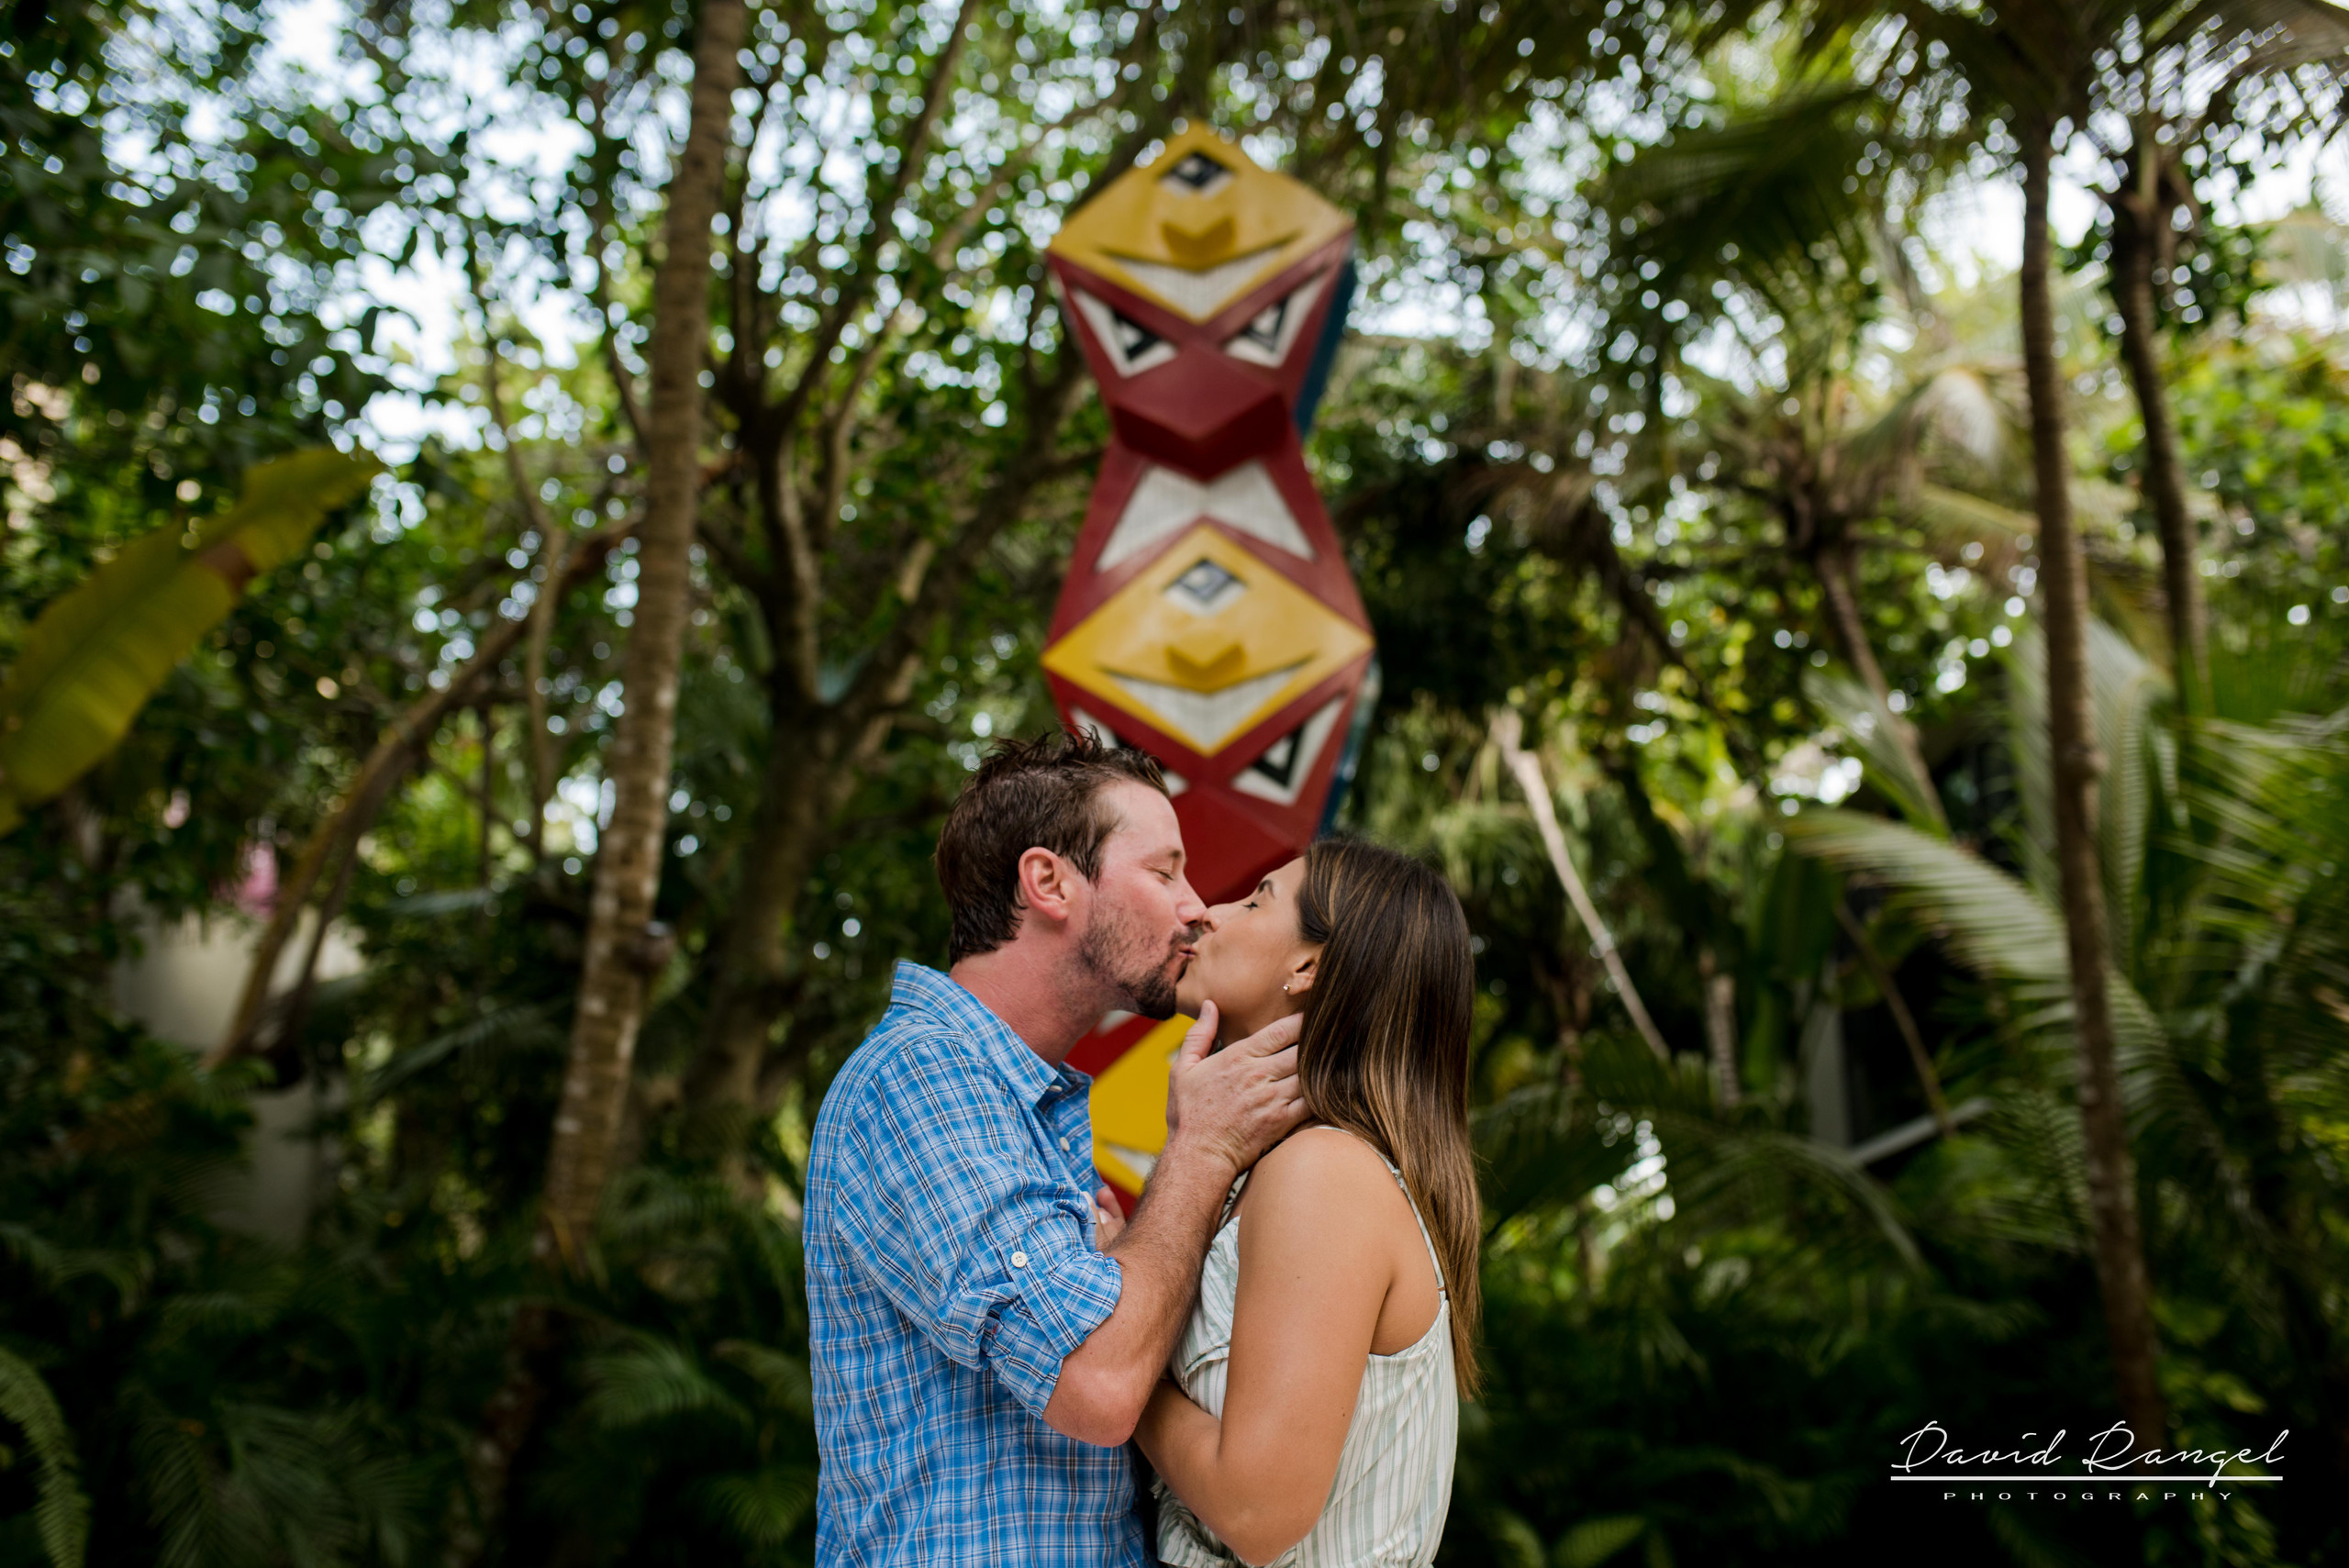 engagement+session+ring+sorprise+beach+vacations+casa+malca+hotel+pedida+de+mano+propuesta+de+matrimonio+pareja+amor+photo+boutique+kiss+garden